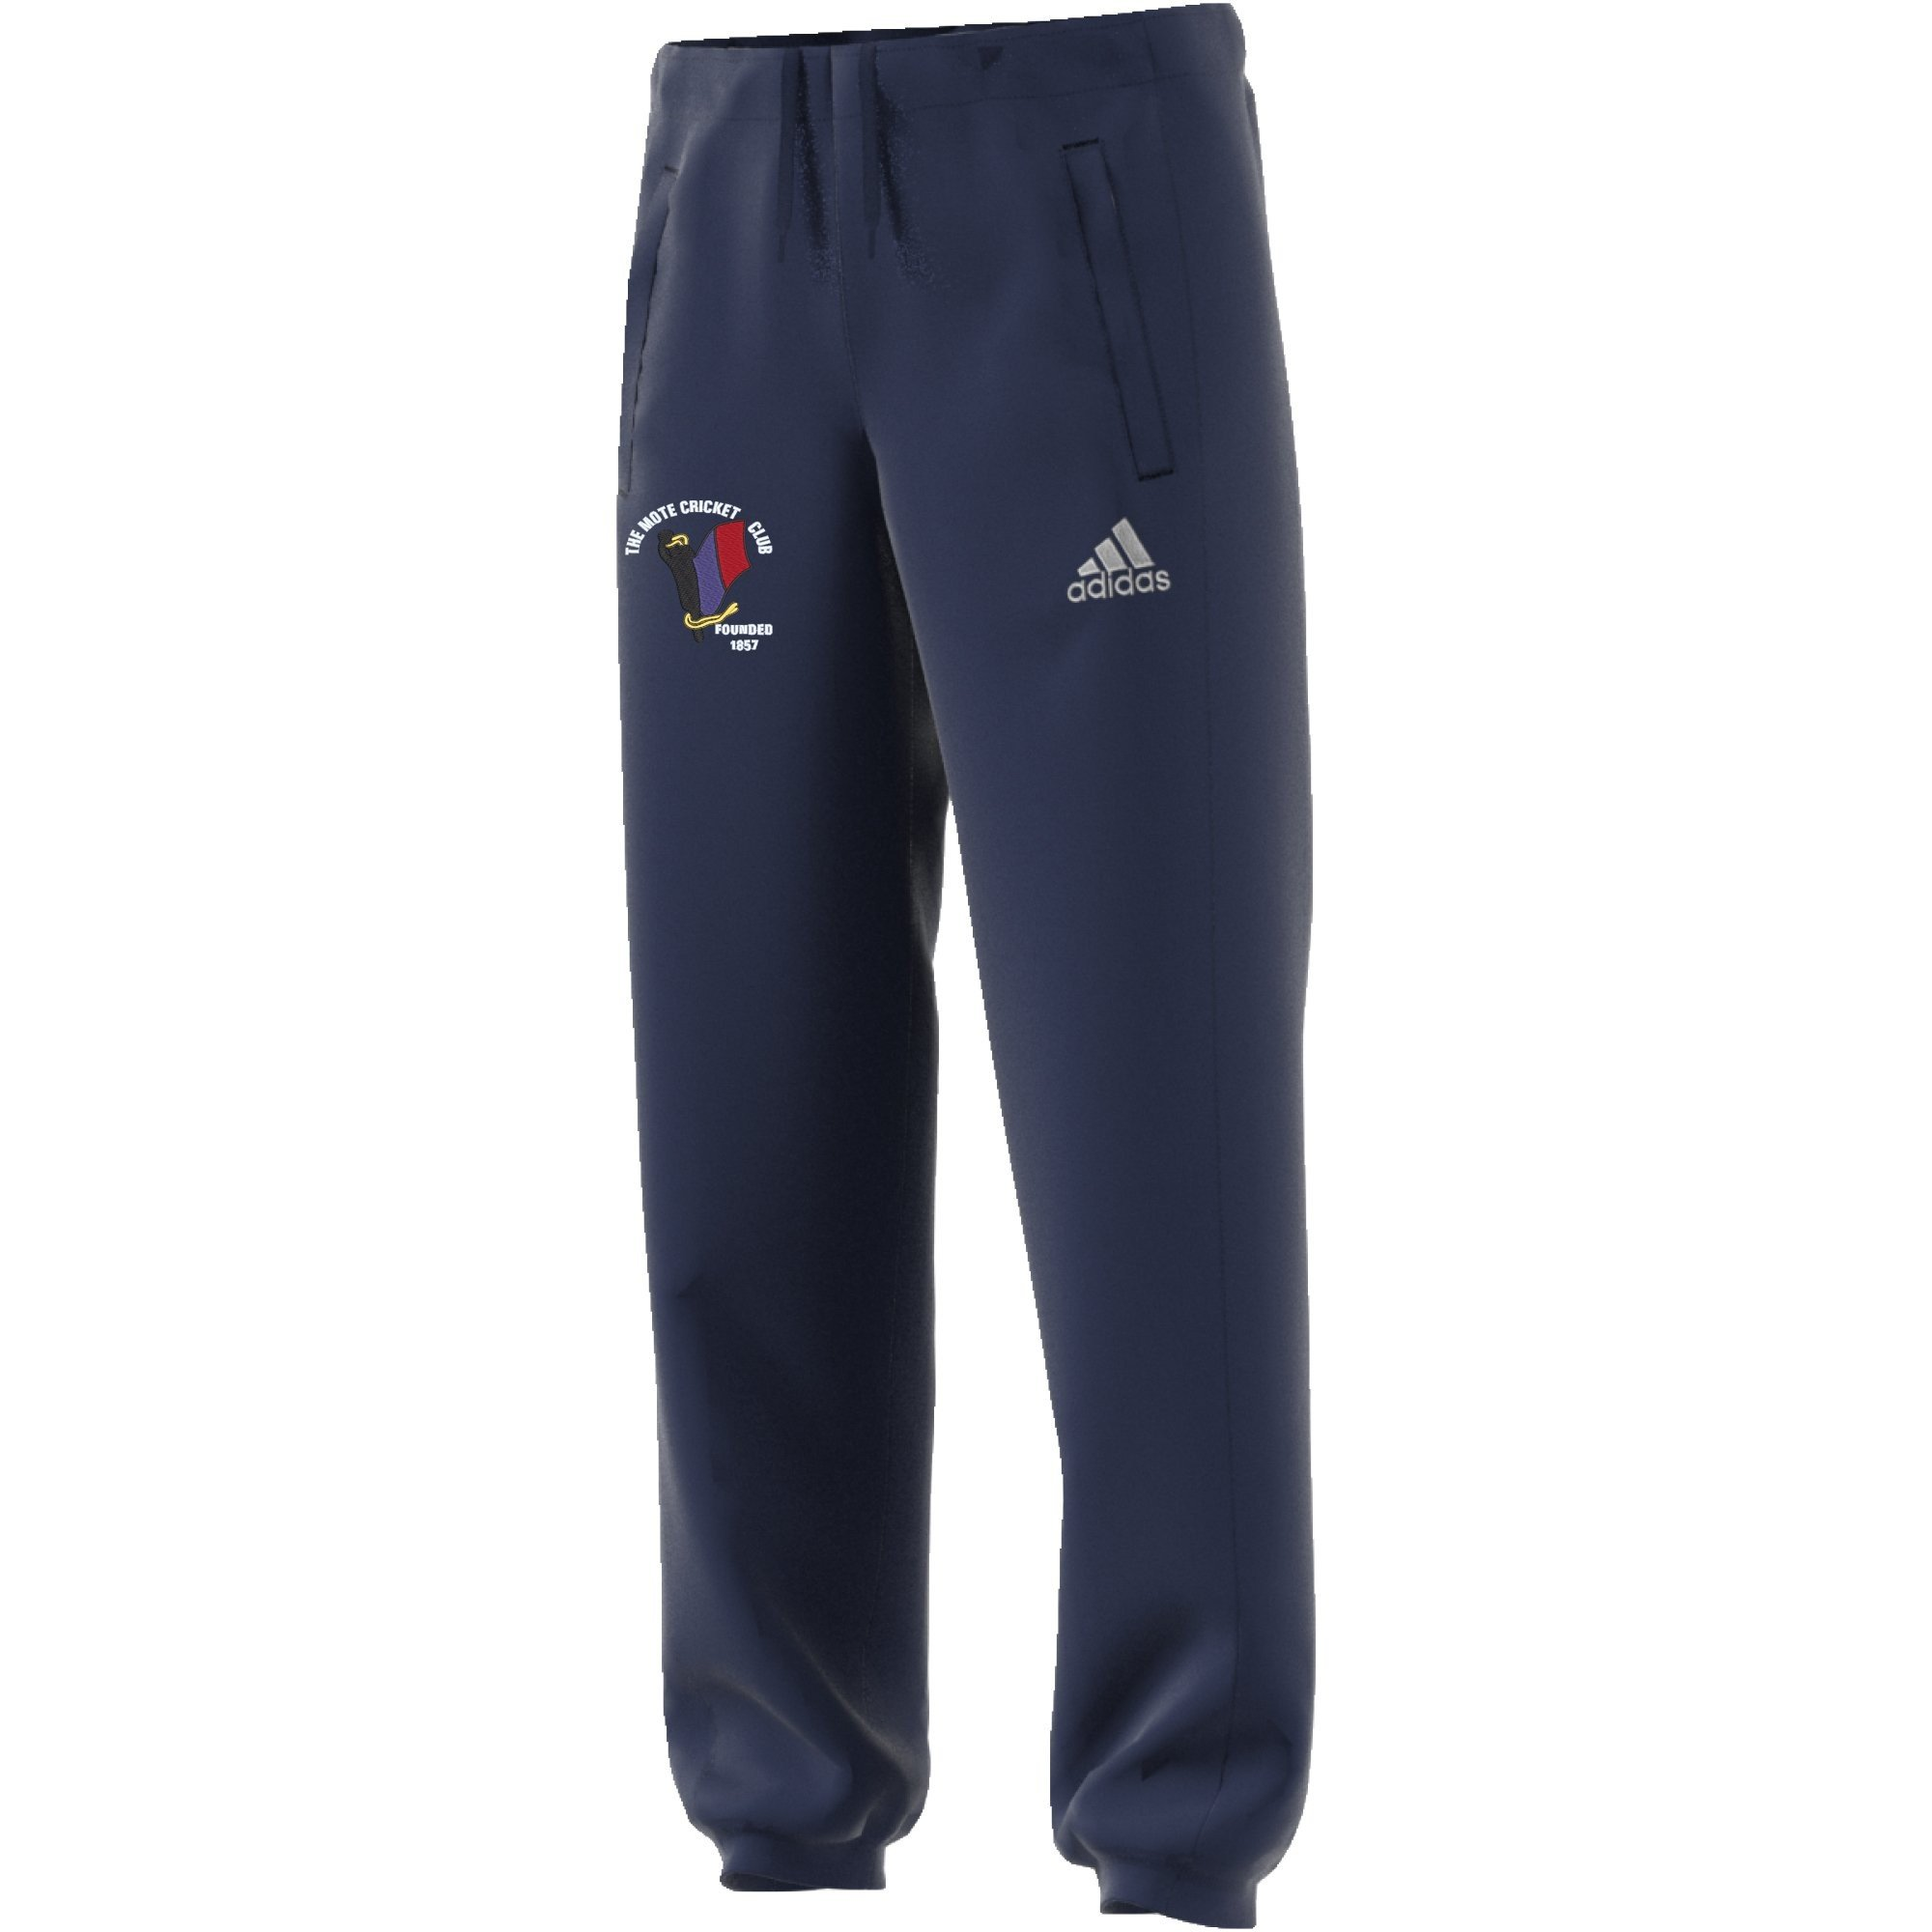 The Mote CC Adidas Navy Sweat Pants